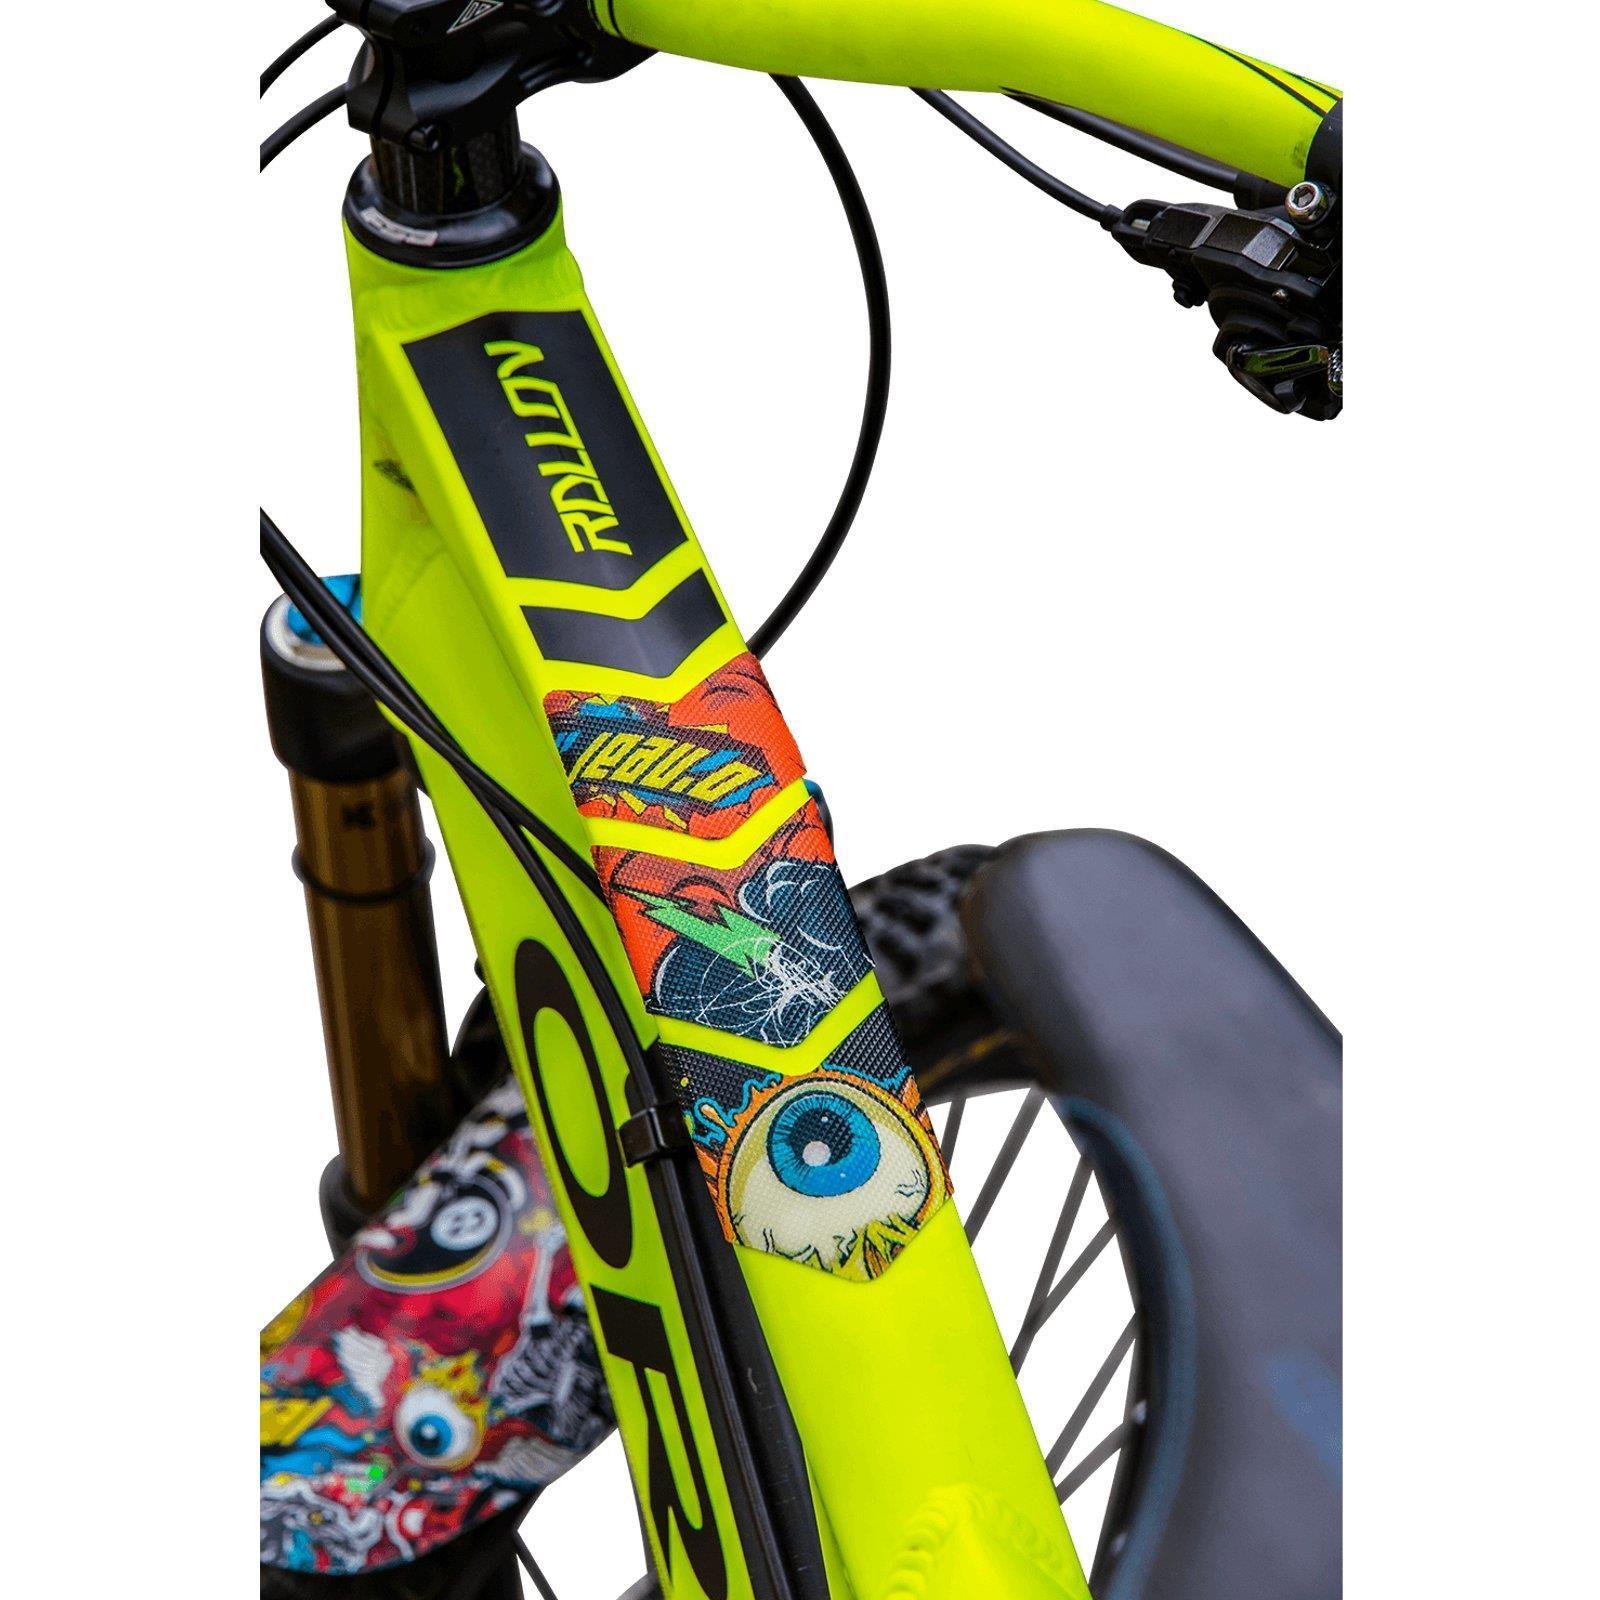 Azonic Frame Guards Kettenstreben Rahmen Schutz Dekor Fahrrad ...